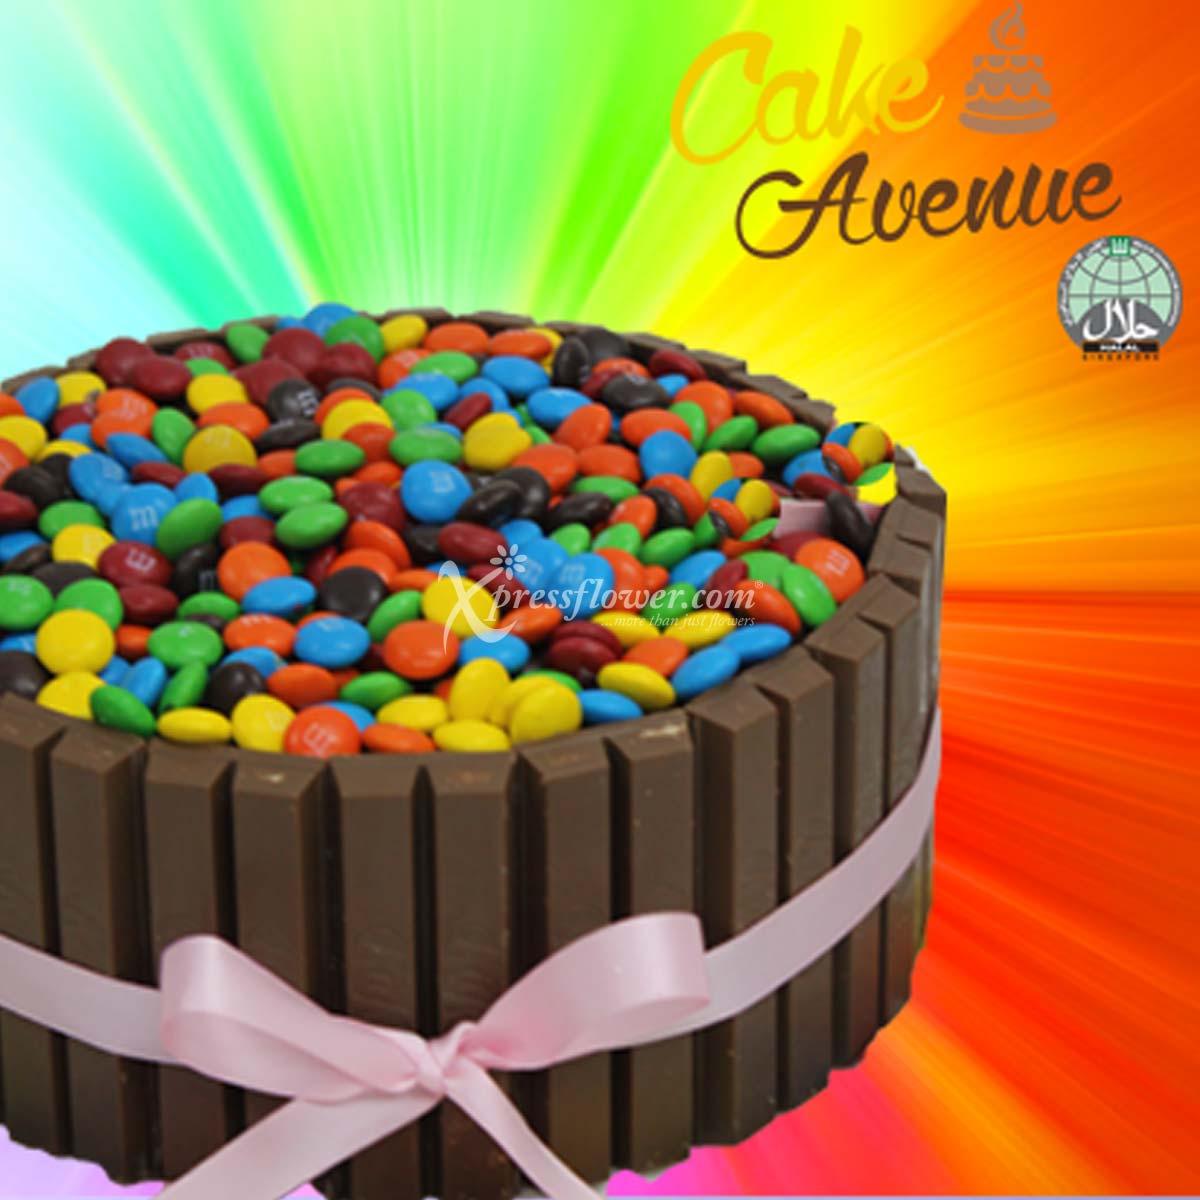 Chocolate Overdose (Cake Avenue)